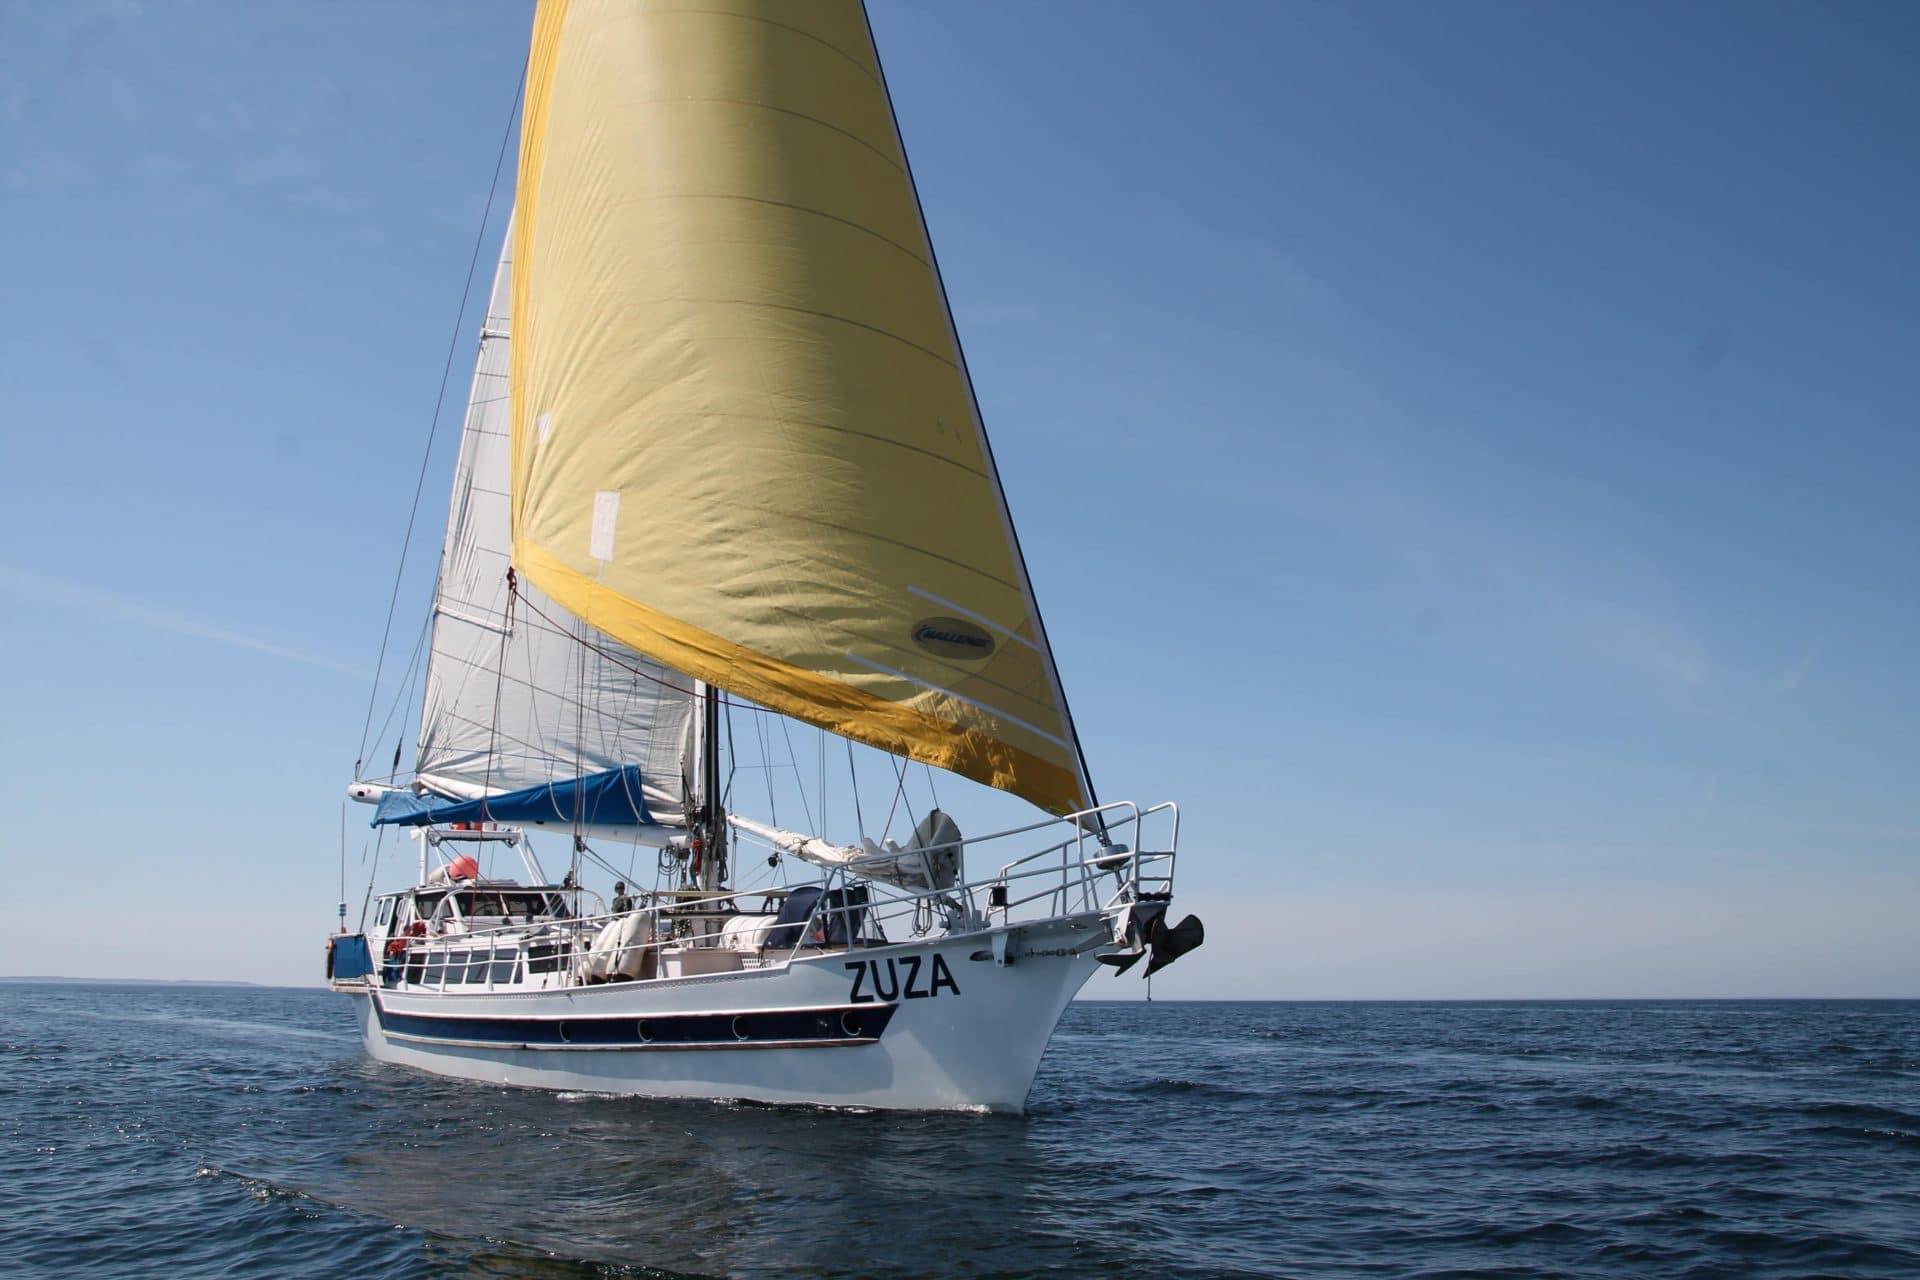 Zuza under sail